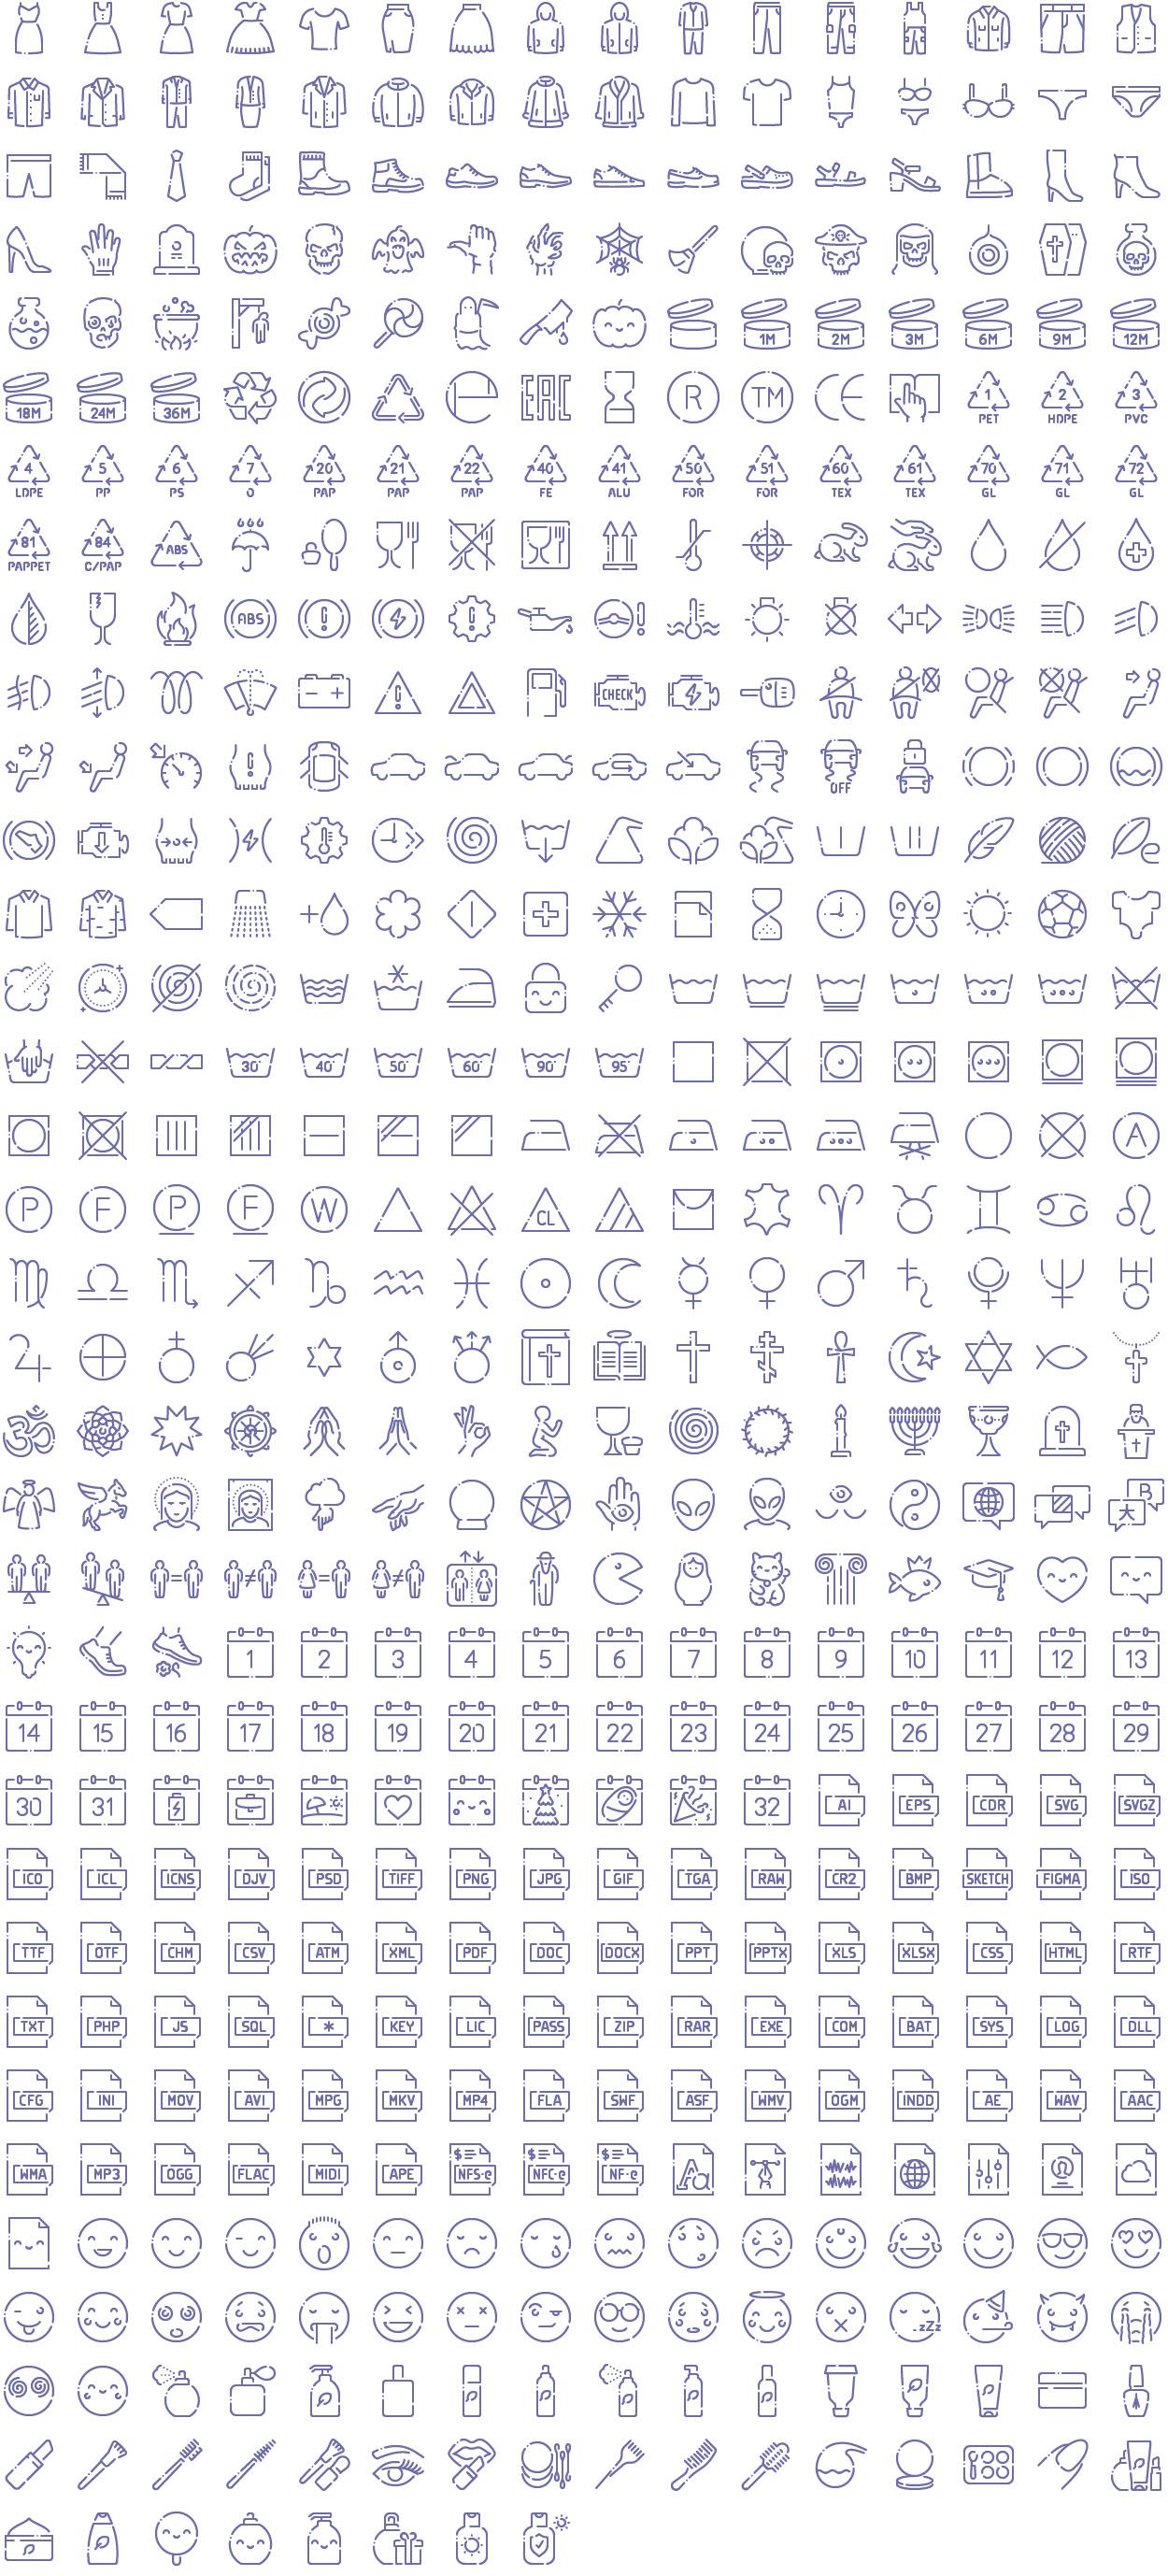 Unilite 2 icons